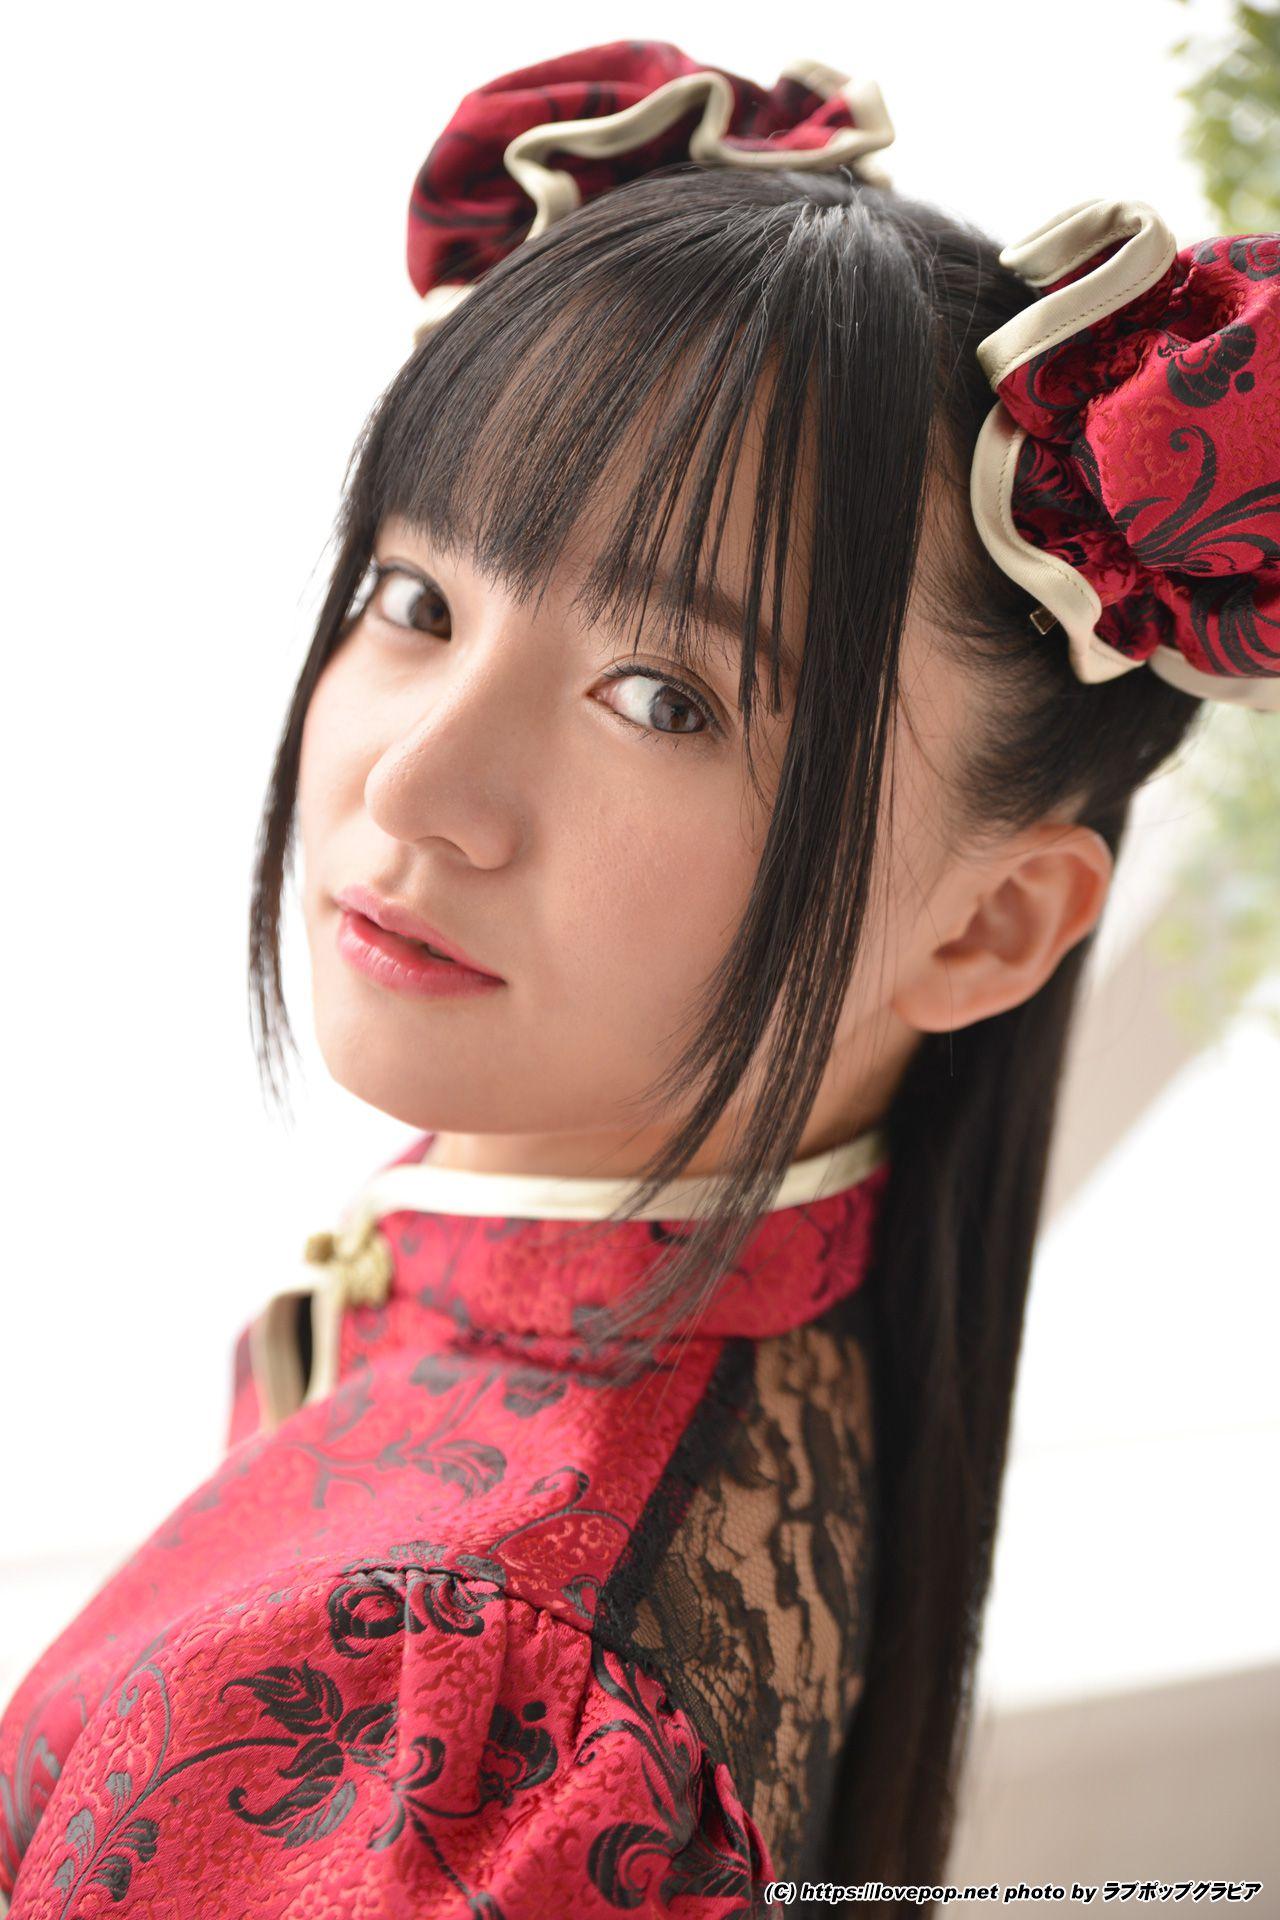 Ayana Nishinaga 西永彩奈 [LOVEPOP] Photoset 02 写真集[70P]插图(9)